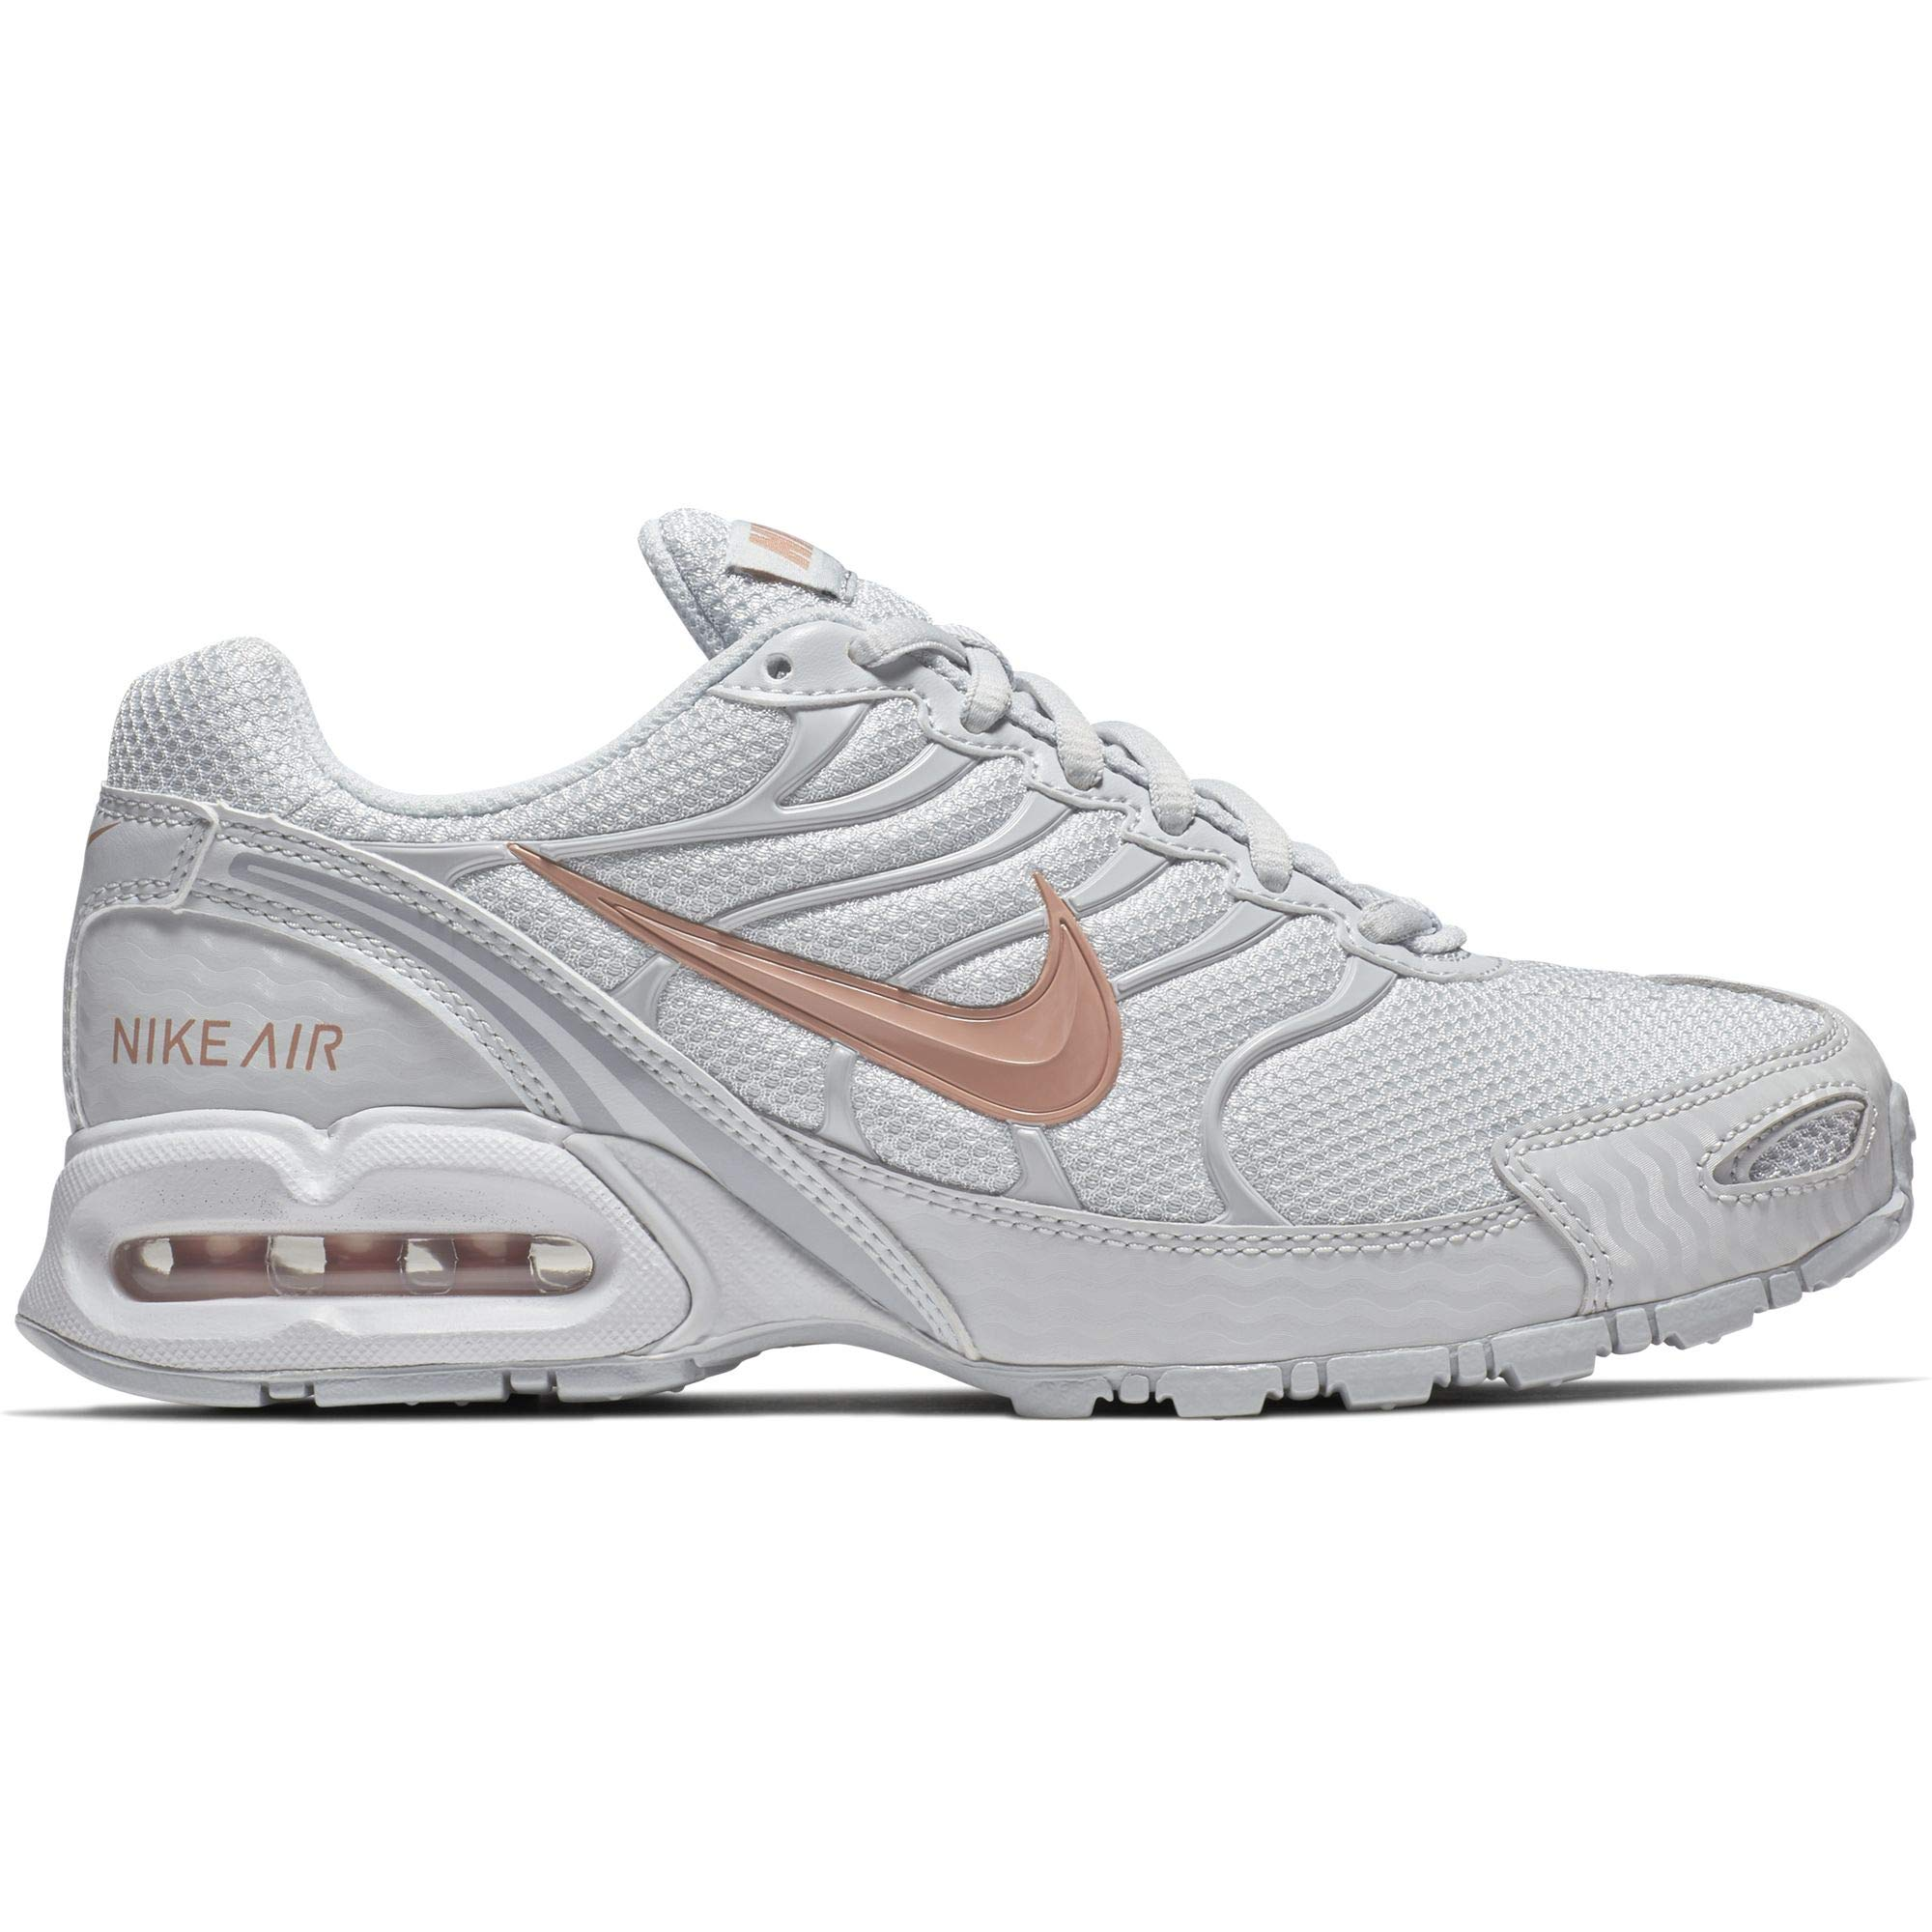 80c195da5c9 Galleon - Nike Women s Air Max Torch 4 Running Shoes (9.5 M US